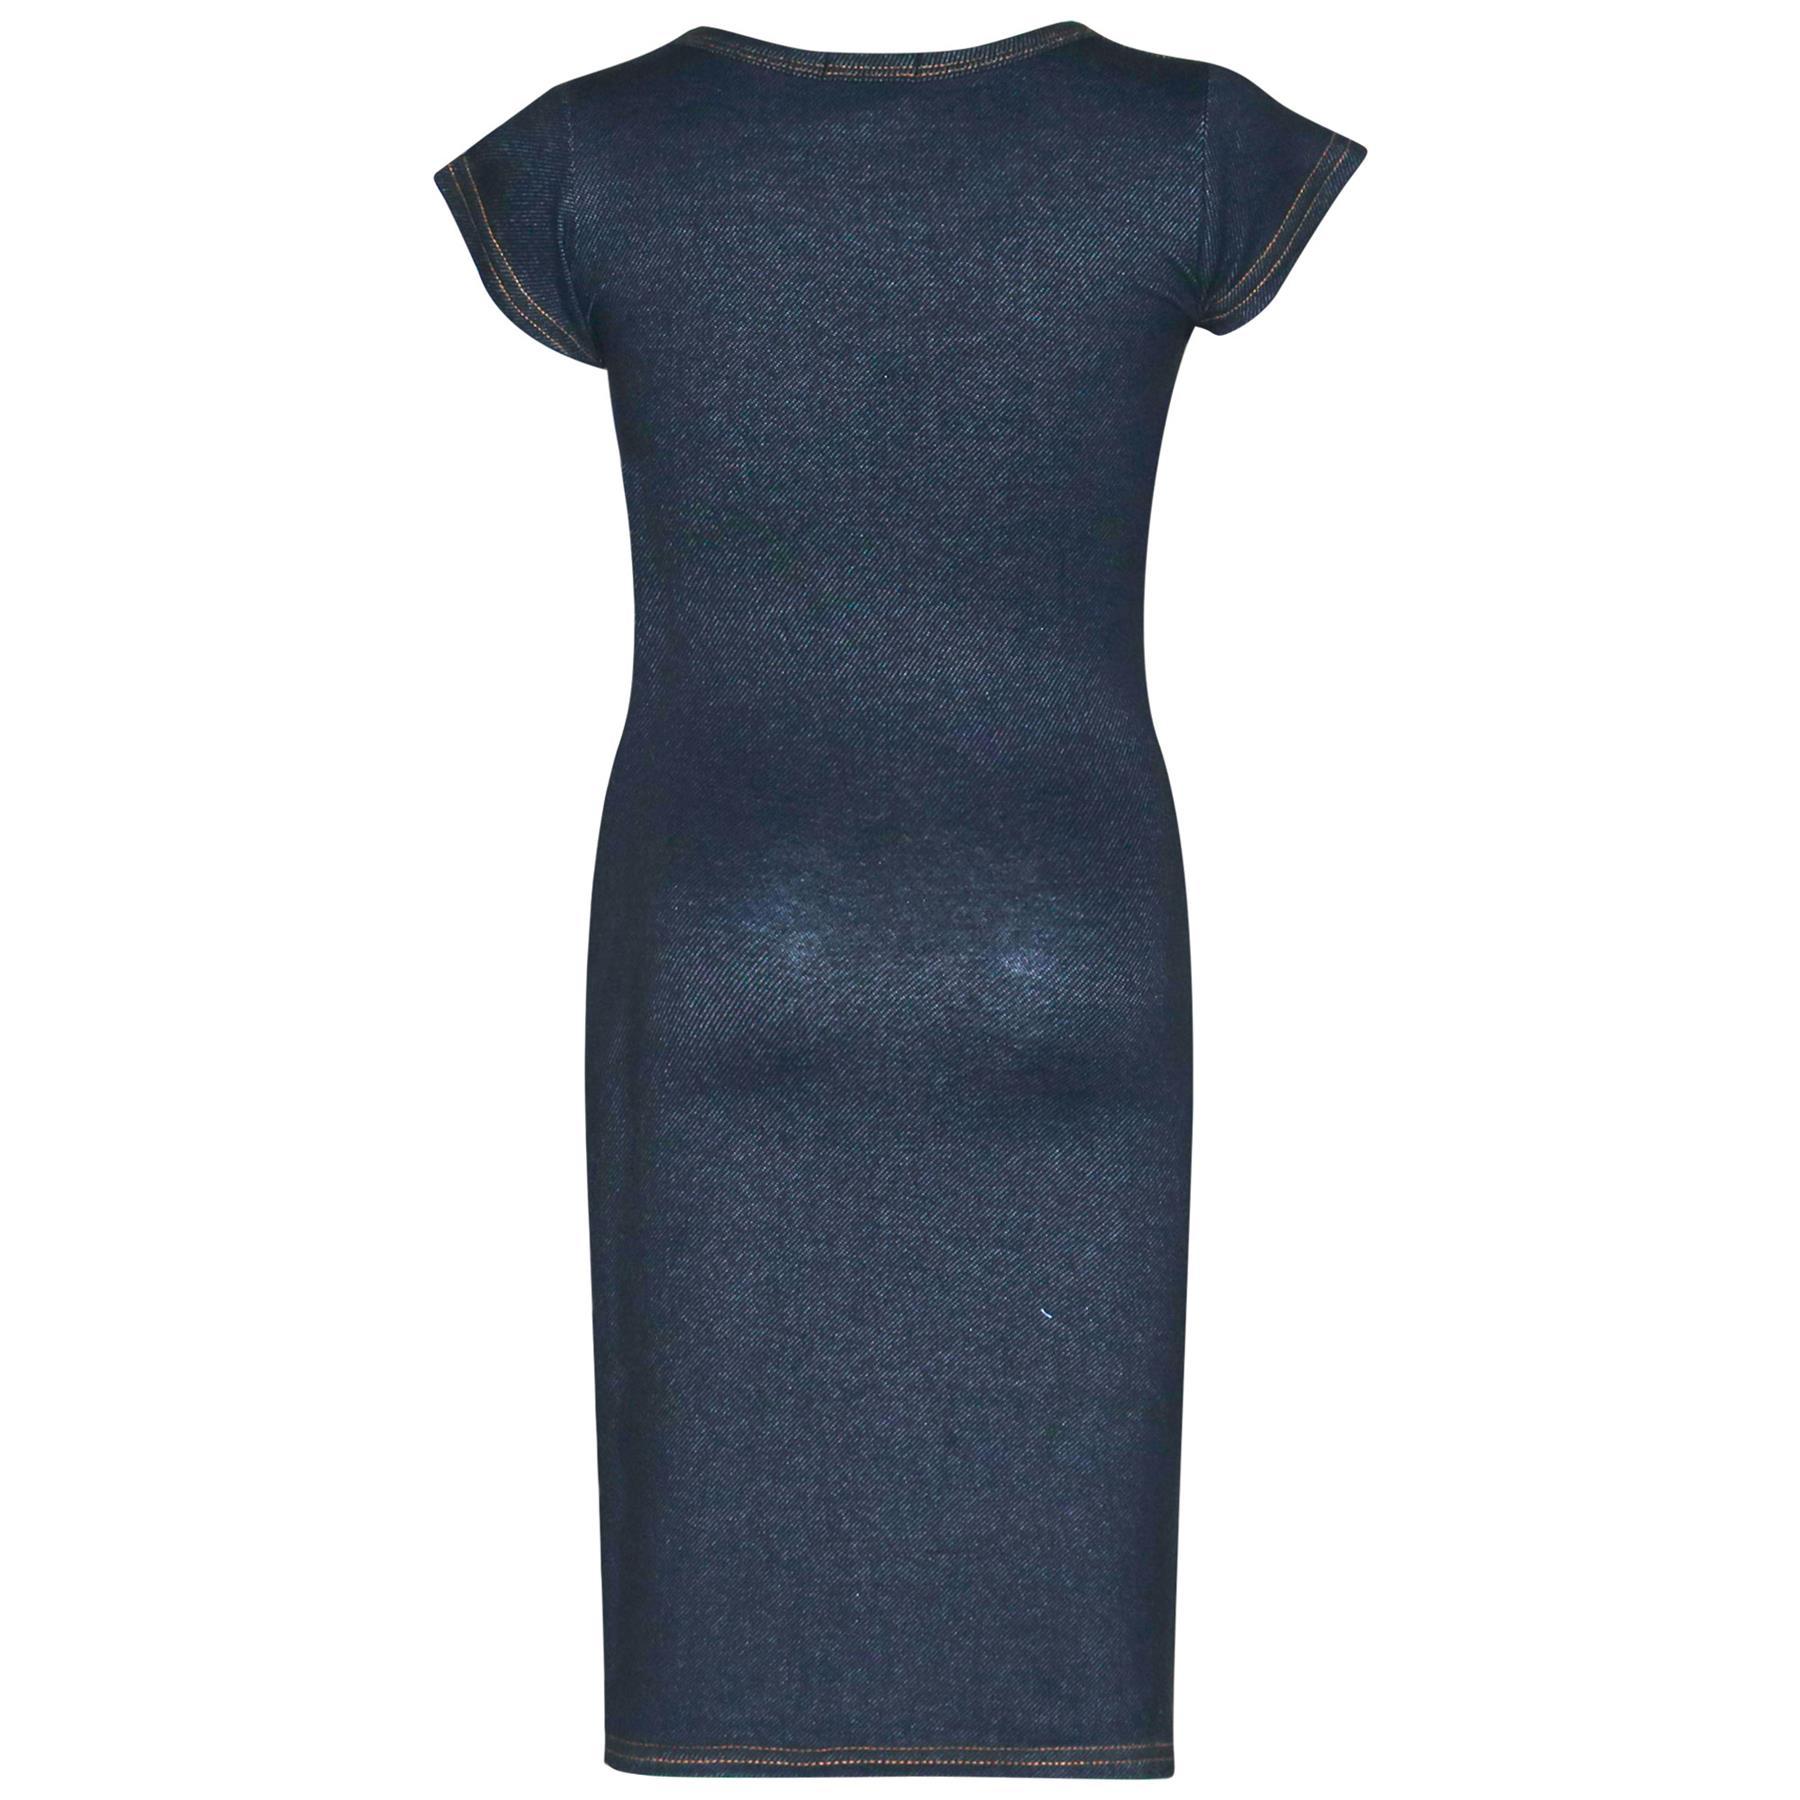 Gilrs Midi Dress Kids 100/% Polyester Plain Bodycon Fashion Dresses Age 5-13 Year